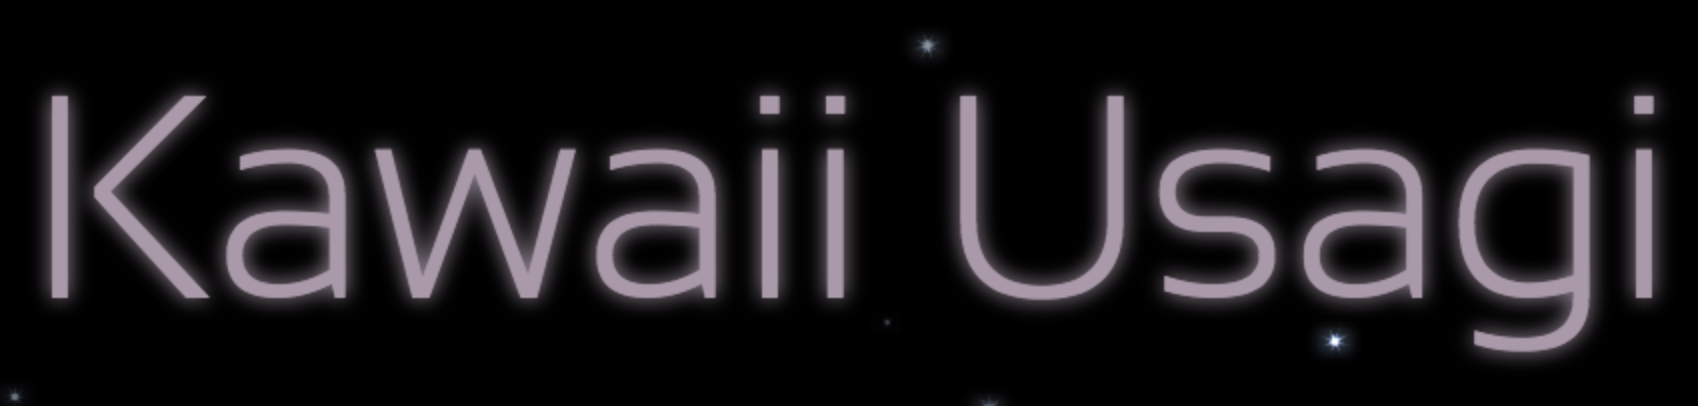 Kawai Usagi